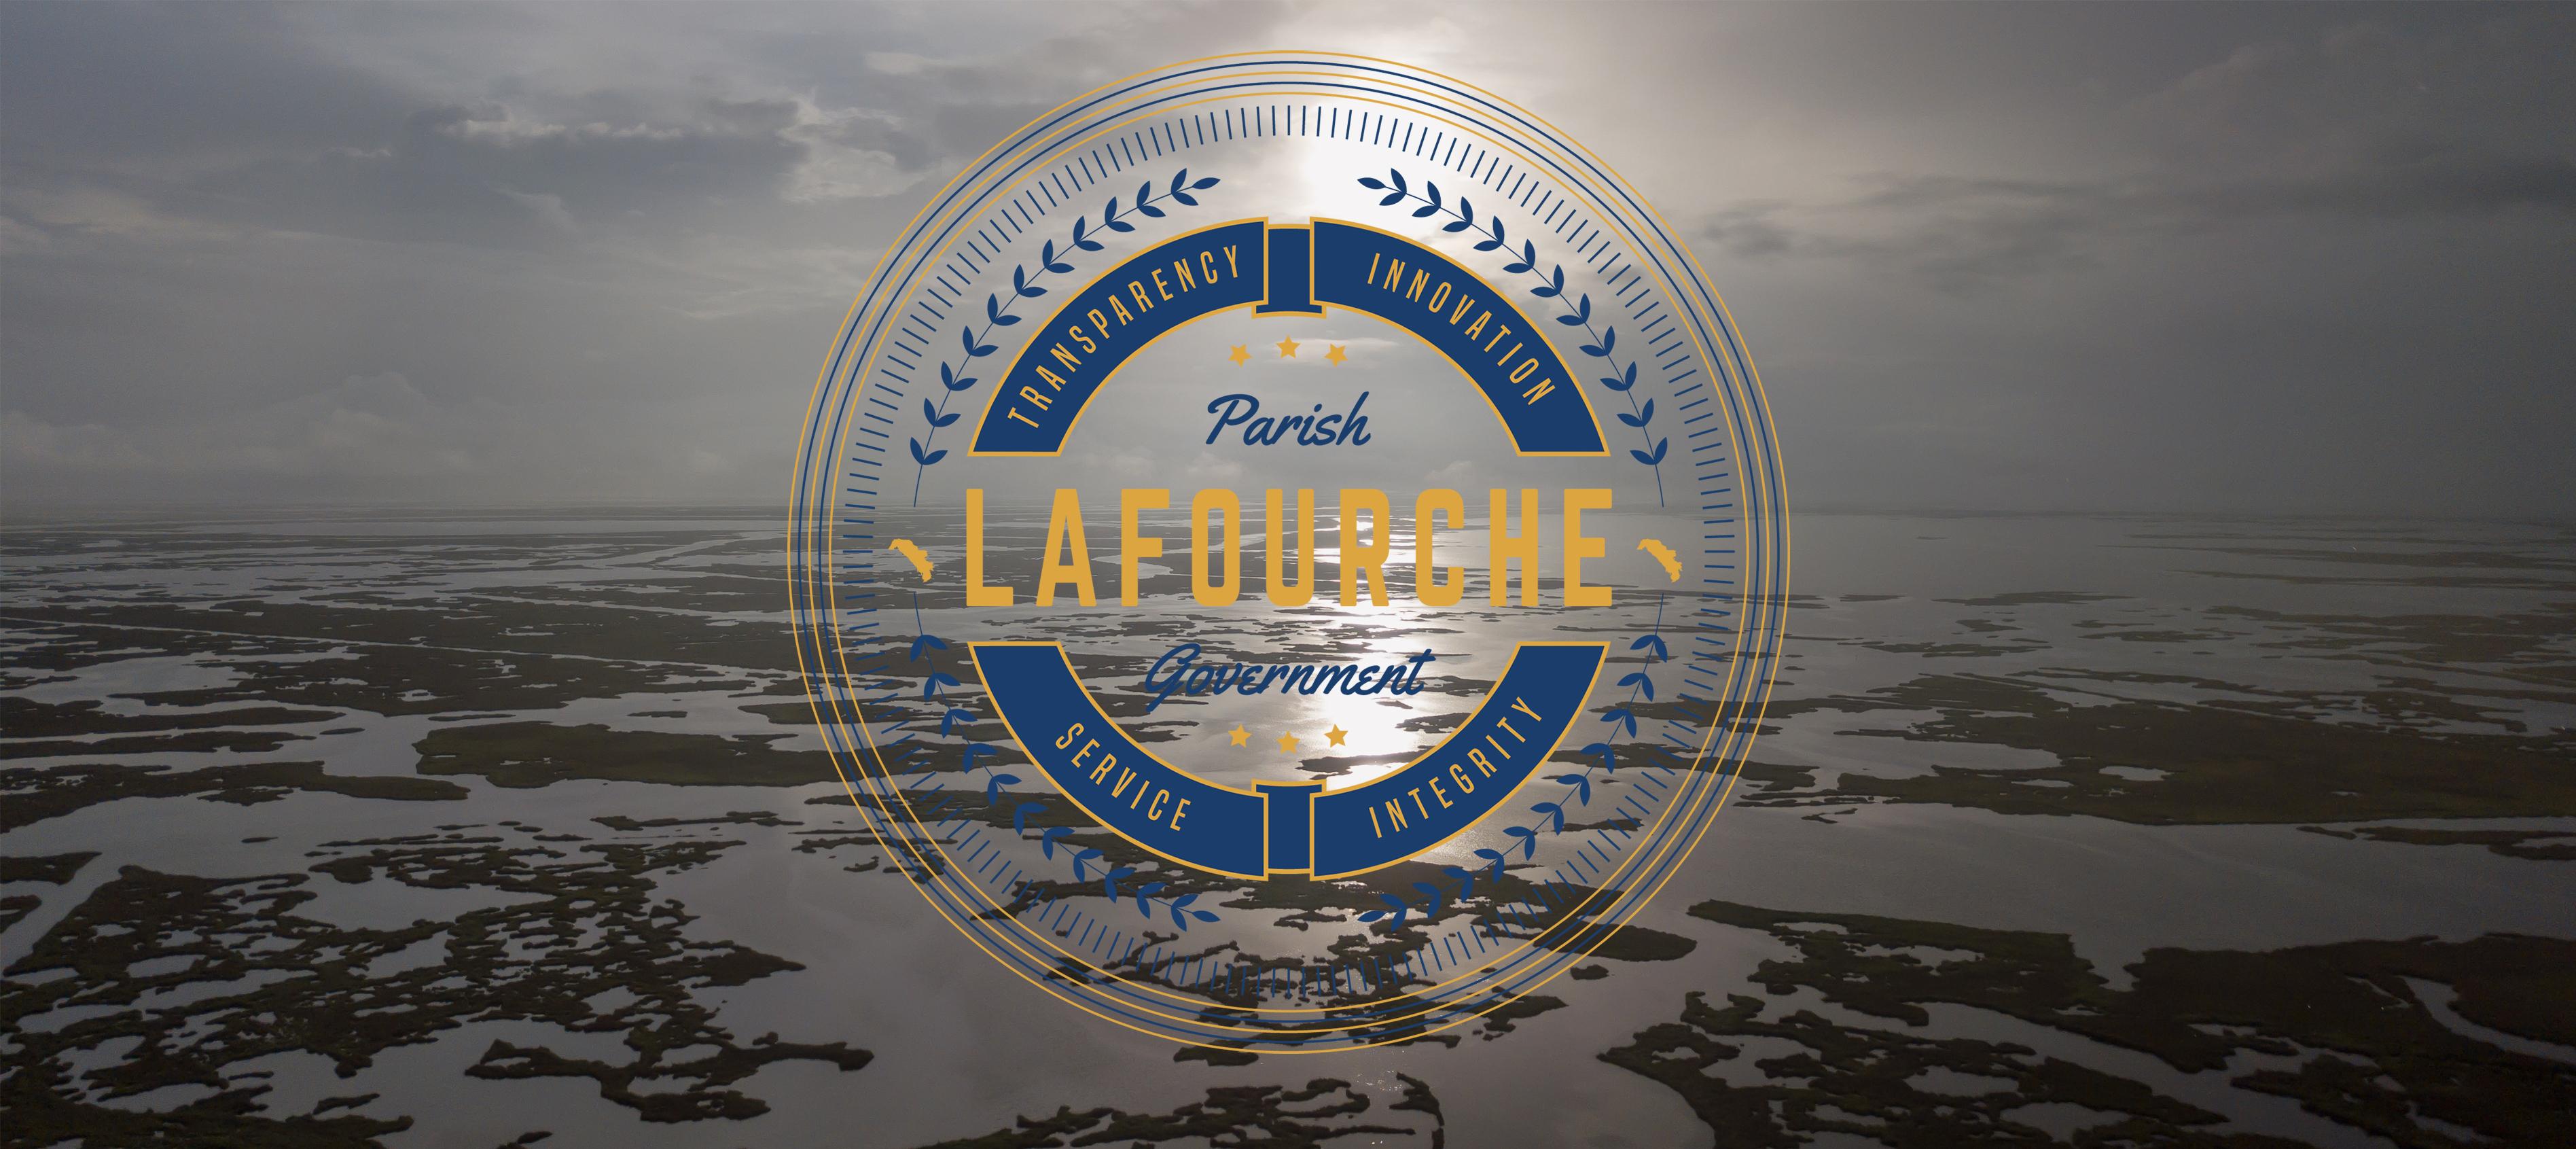 Lafourche Logo Over Marsh